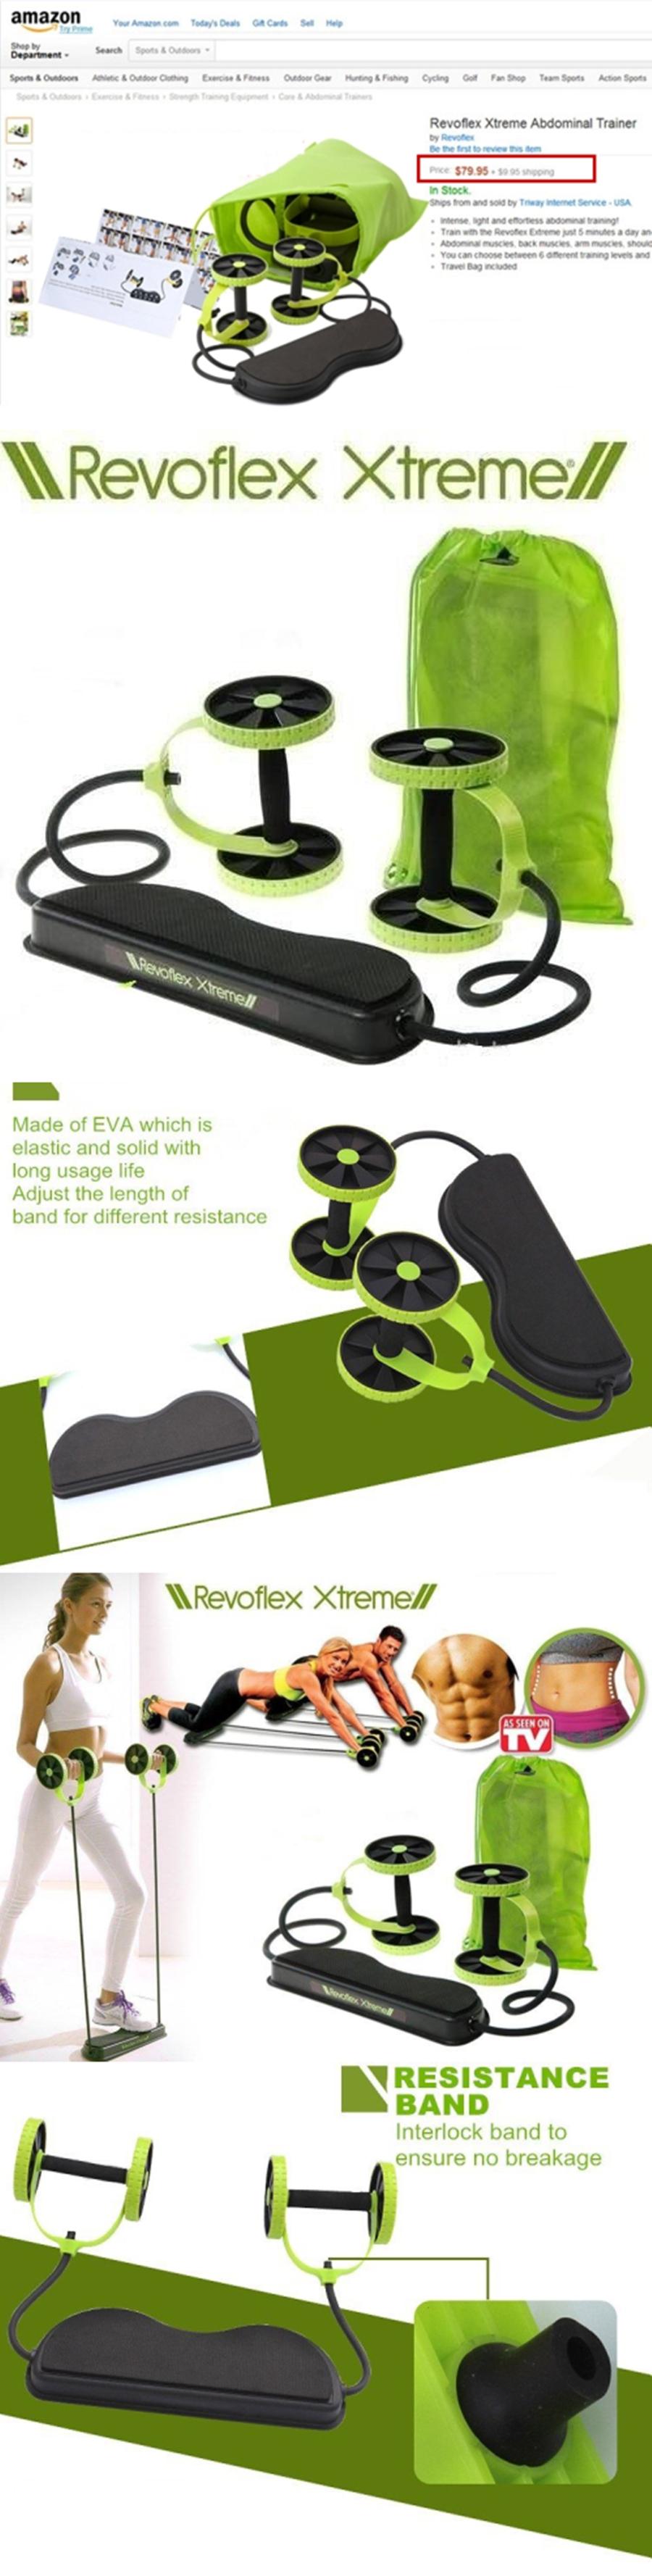 Buy Revoflex Extreme Revoflex Xtreme Home Gym Abs Machine Resistance Band Workout